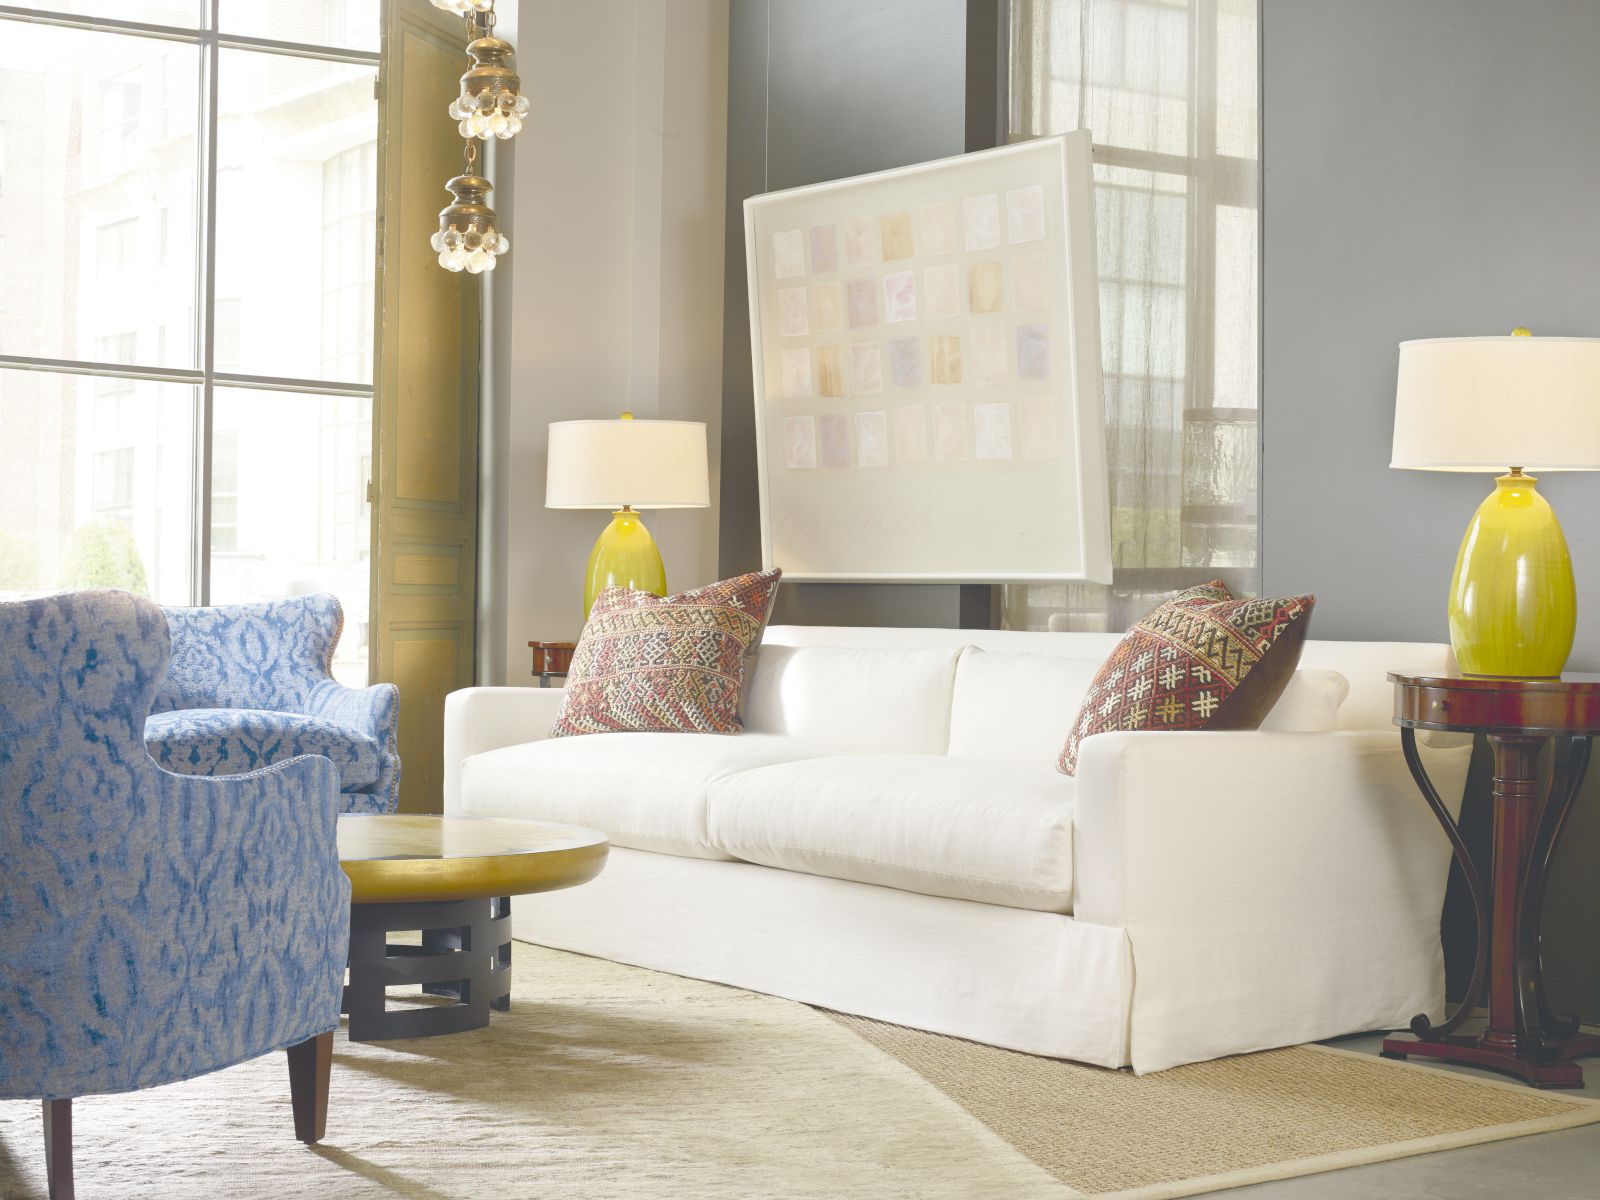 Decor for Living Room Portsmouth, NH